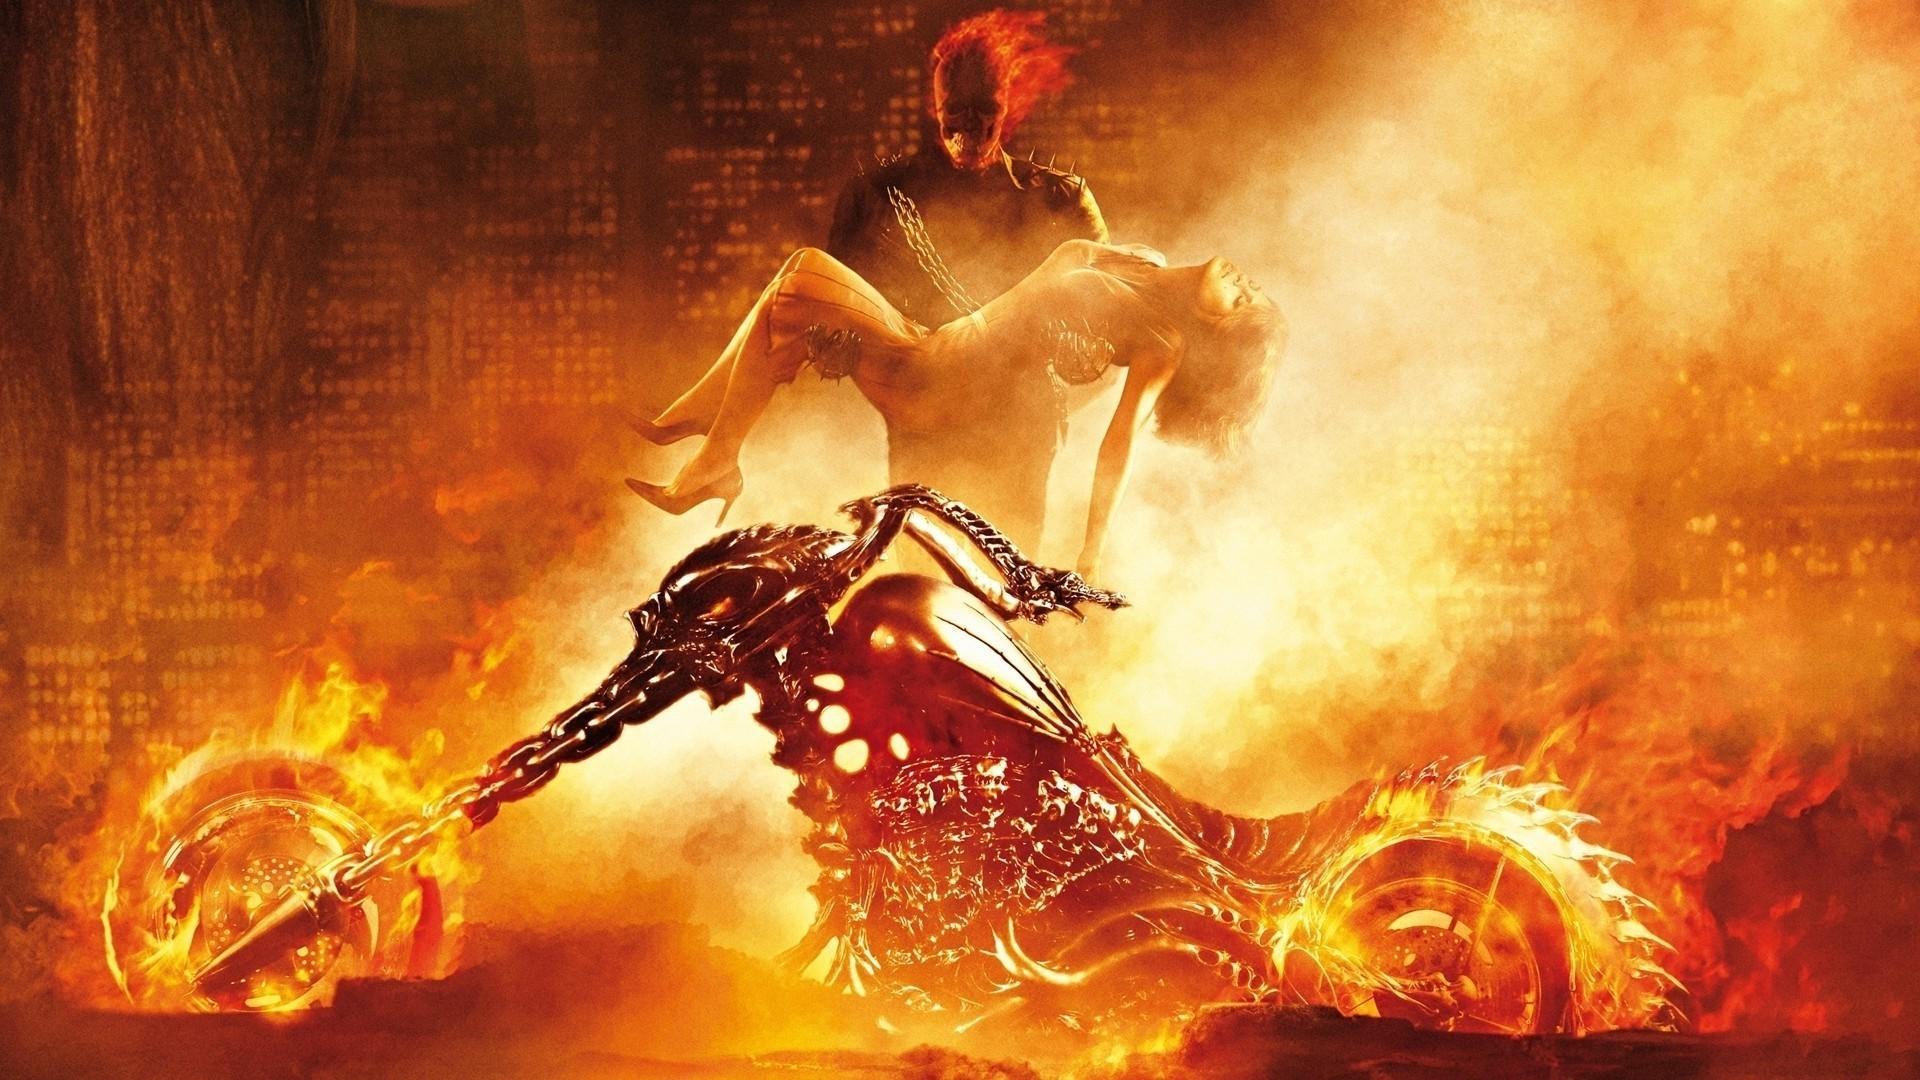 Ghost Rider Wallpaper HD ·① WallpaperTag